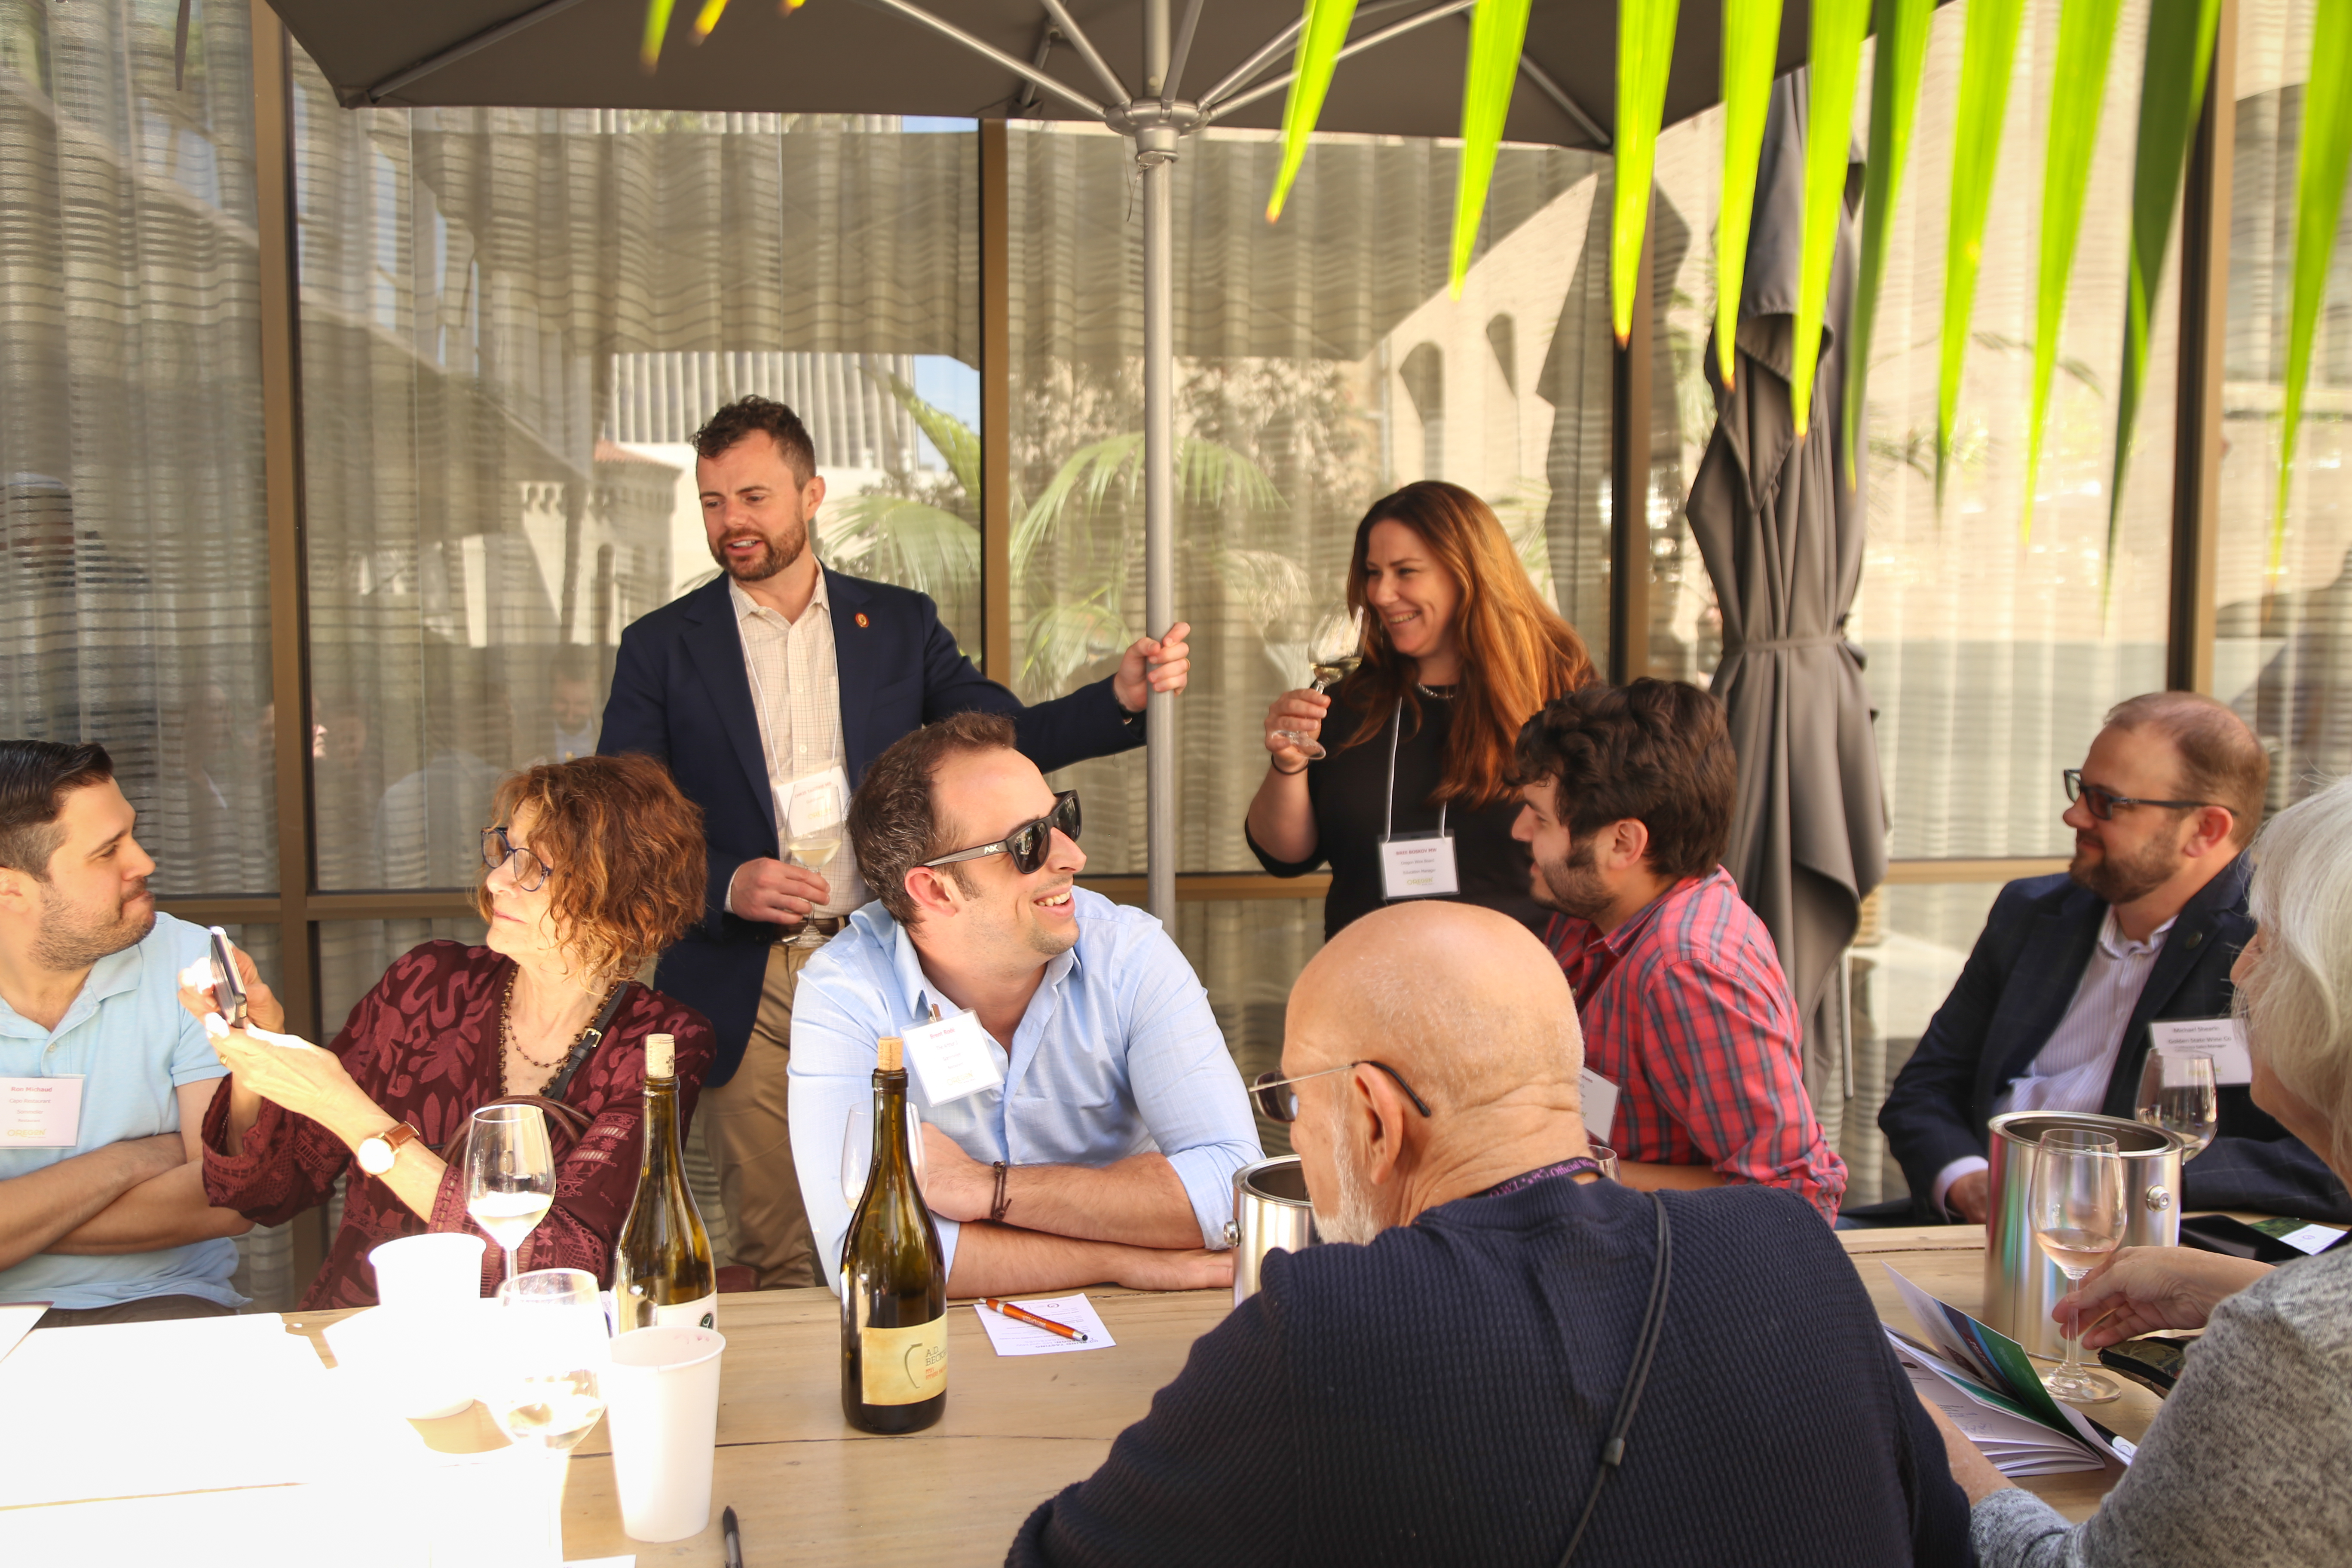 Group wine tasting outside